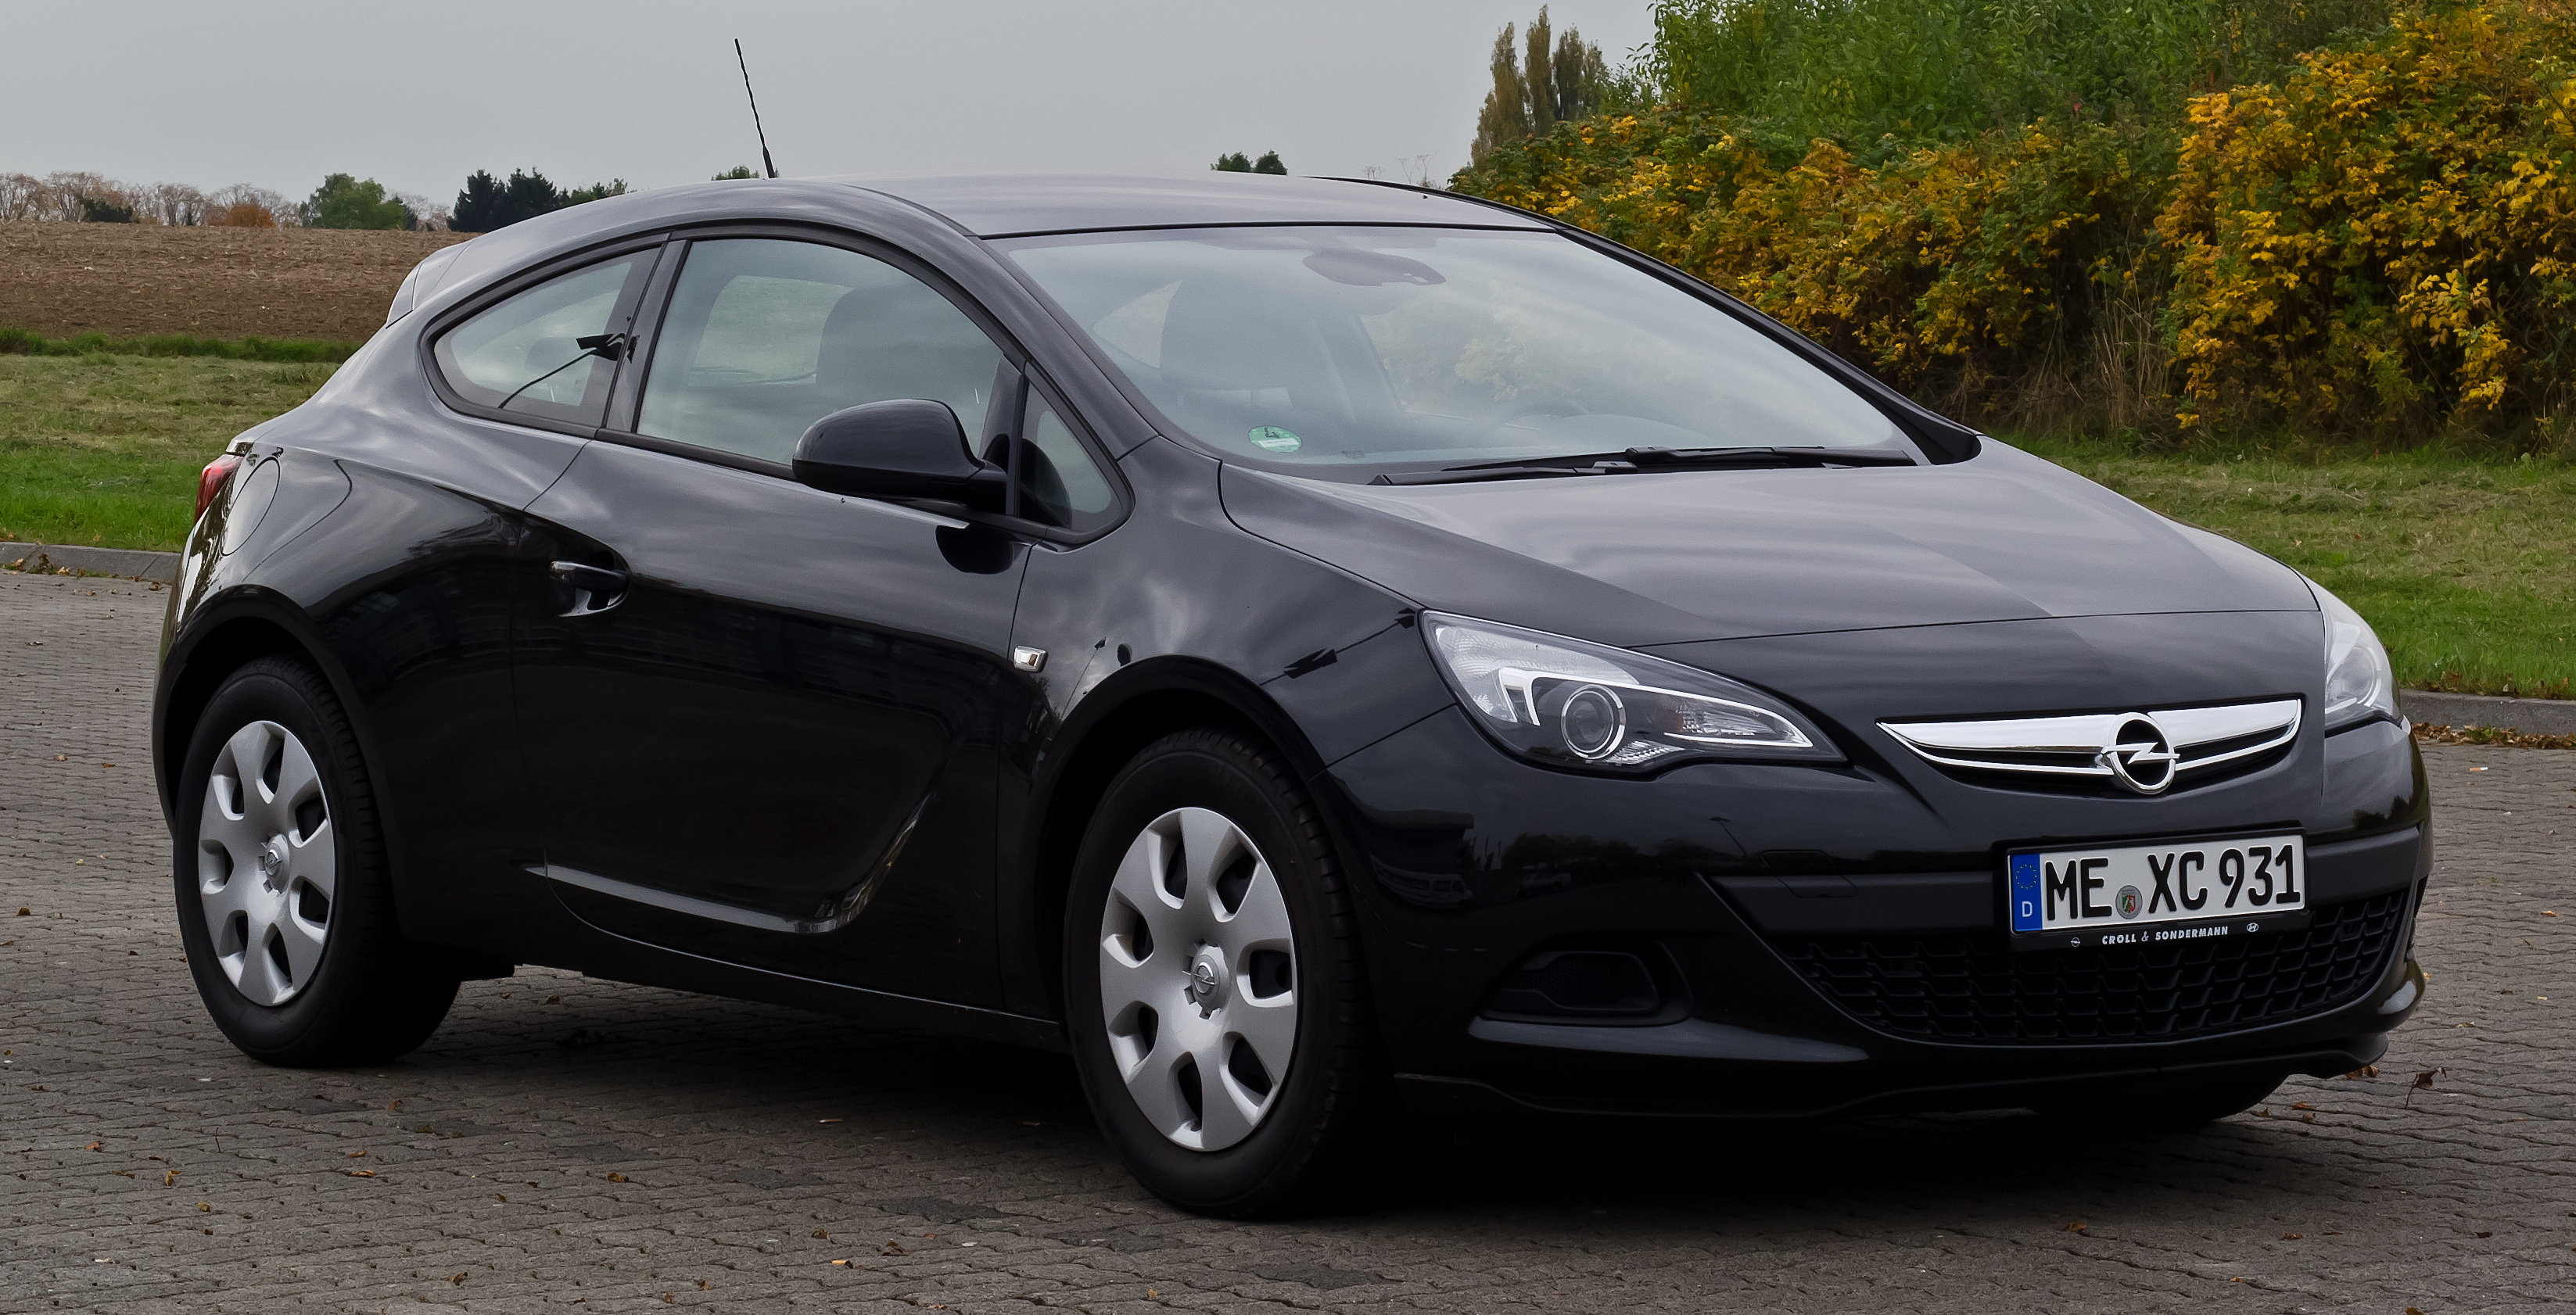 File:Opel Astra GTC 1.4 Turbo ecoFLEX Edition (J ...